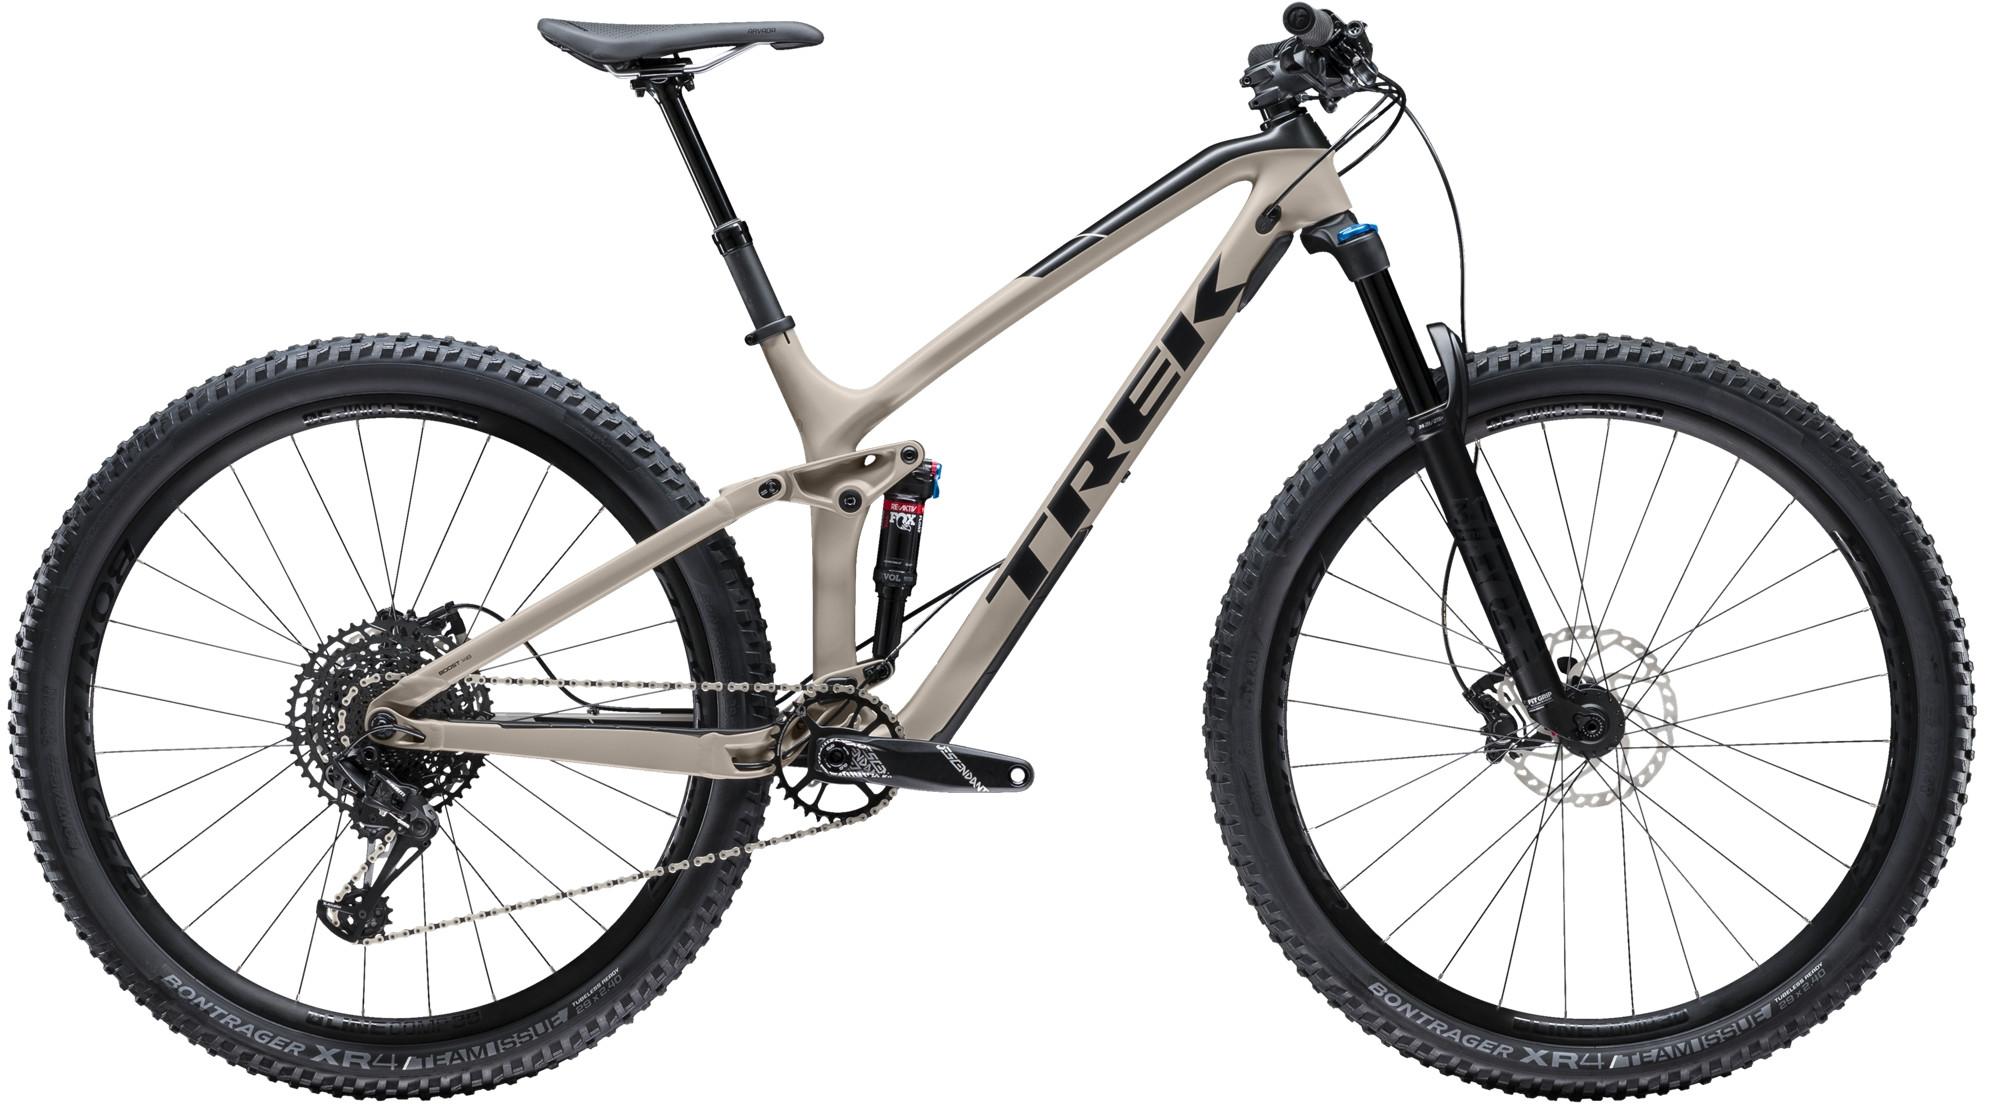 Trek Fuel Ex 9 7 29